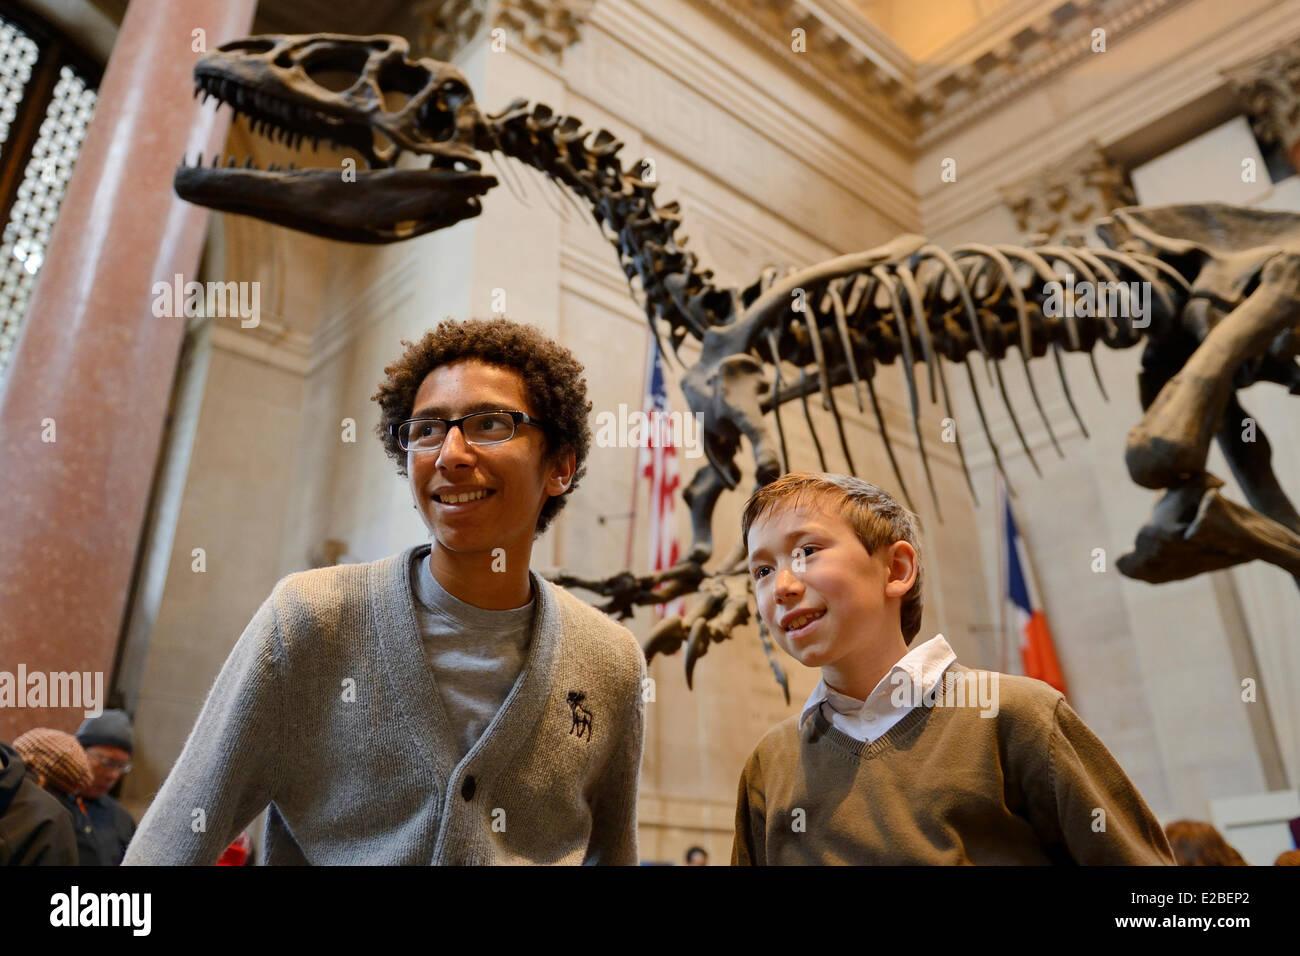 Vereinigte Staaten, New York City, Manhattan, Upper West Side, American Museum of Natural History, Kinder in der Stockbild